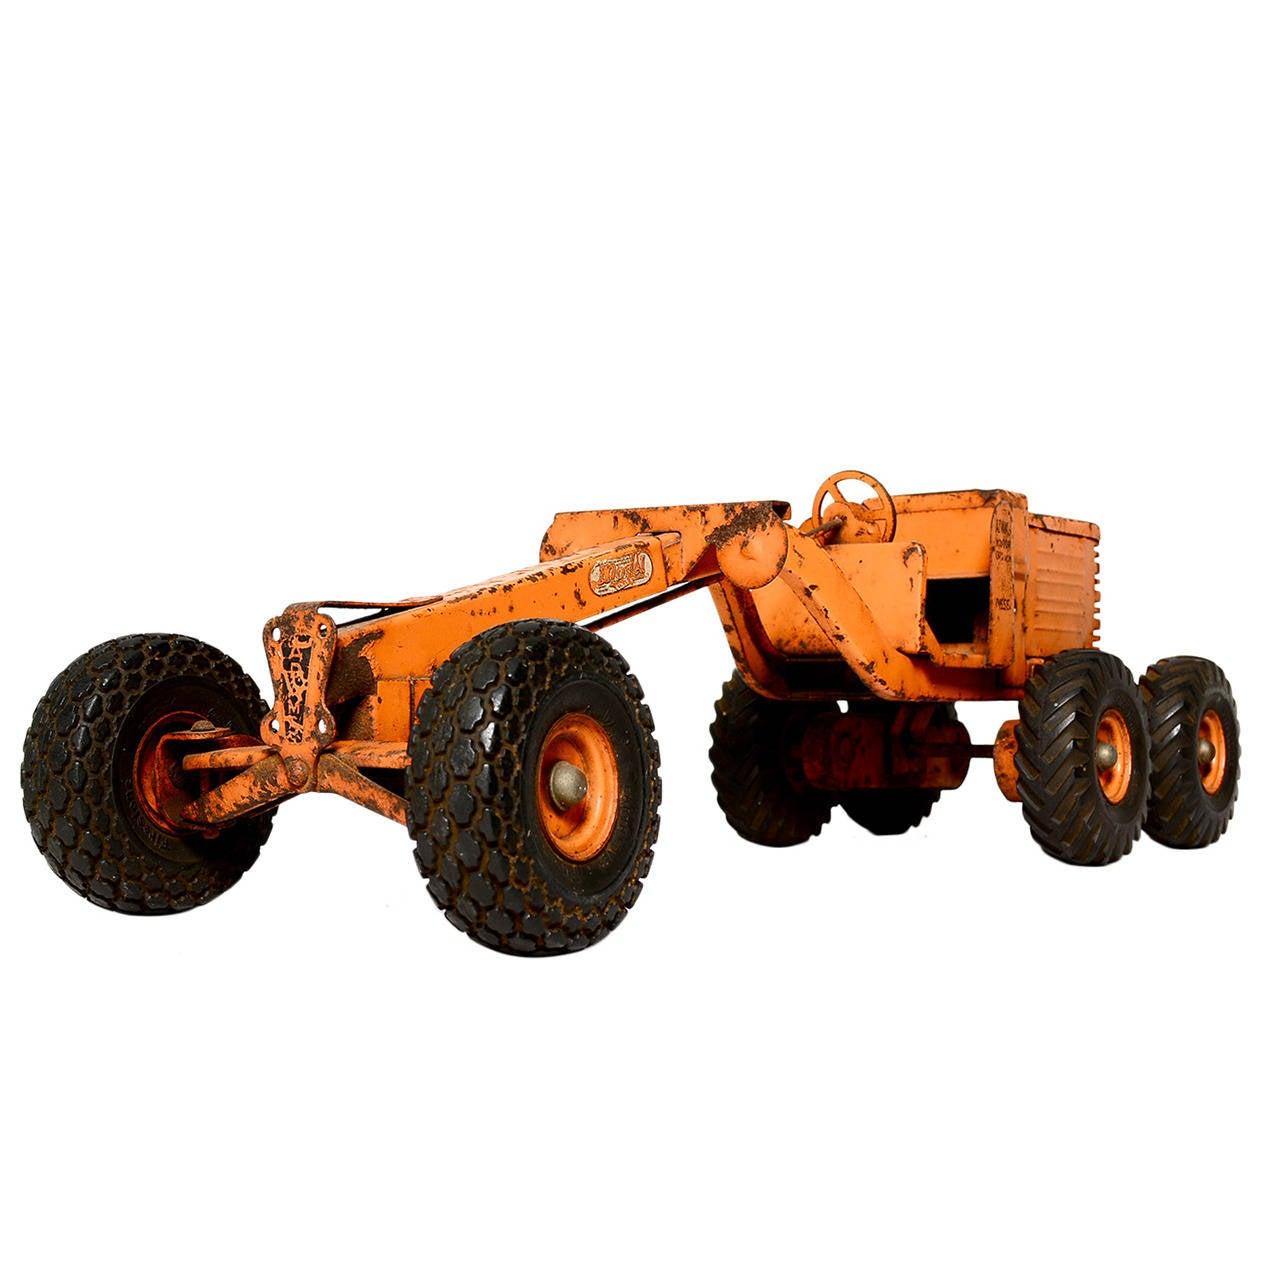 Pressed Metal Toys 33